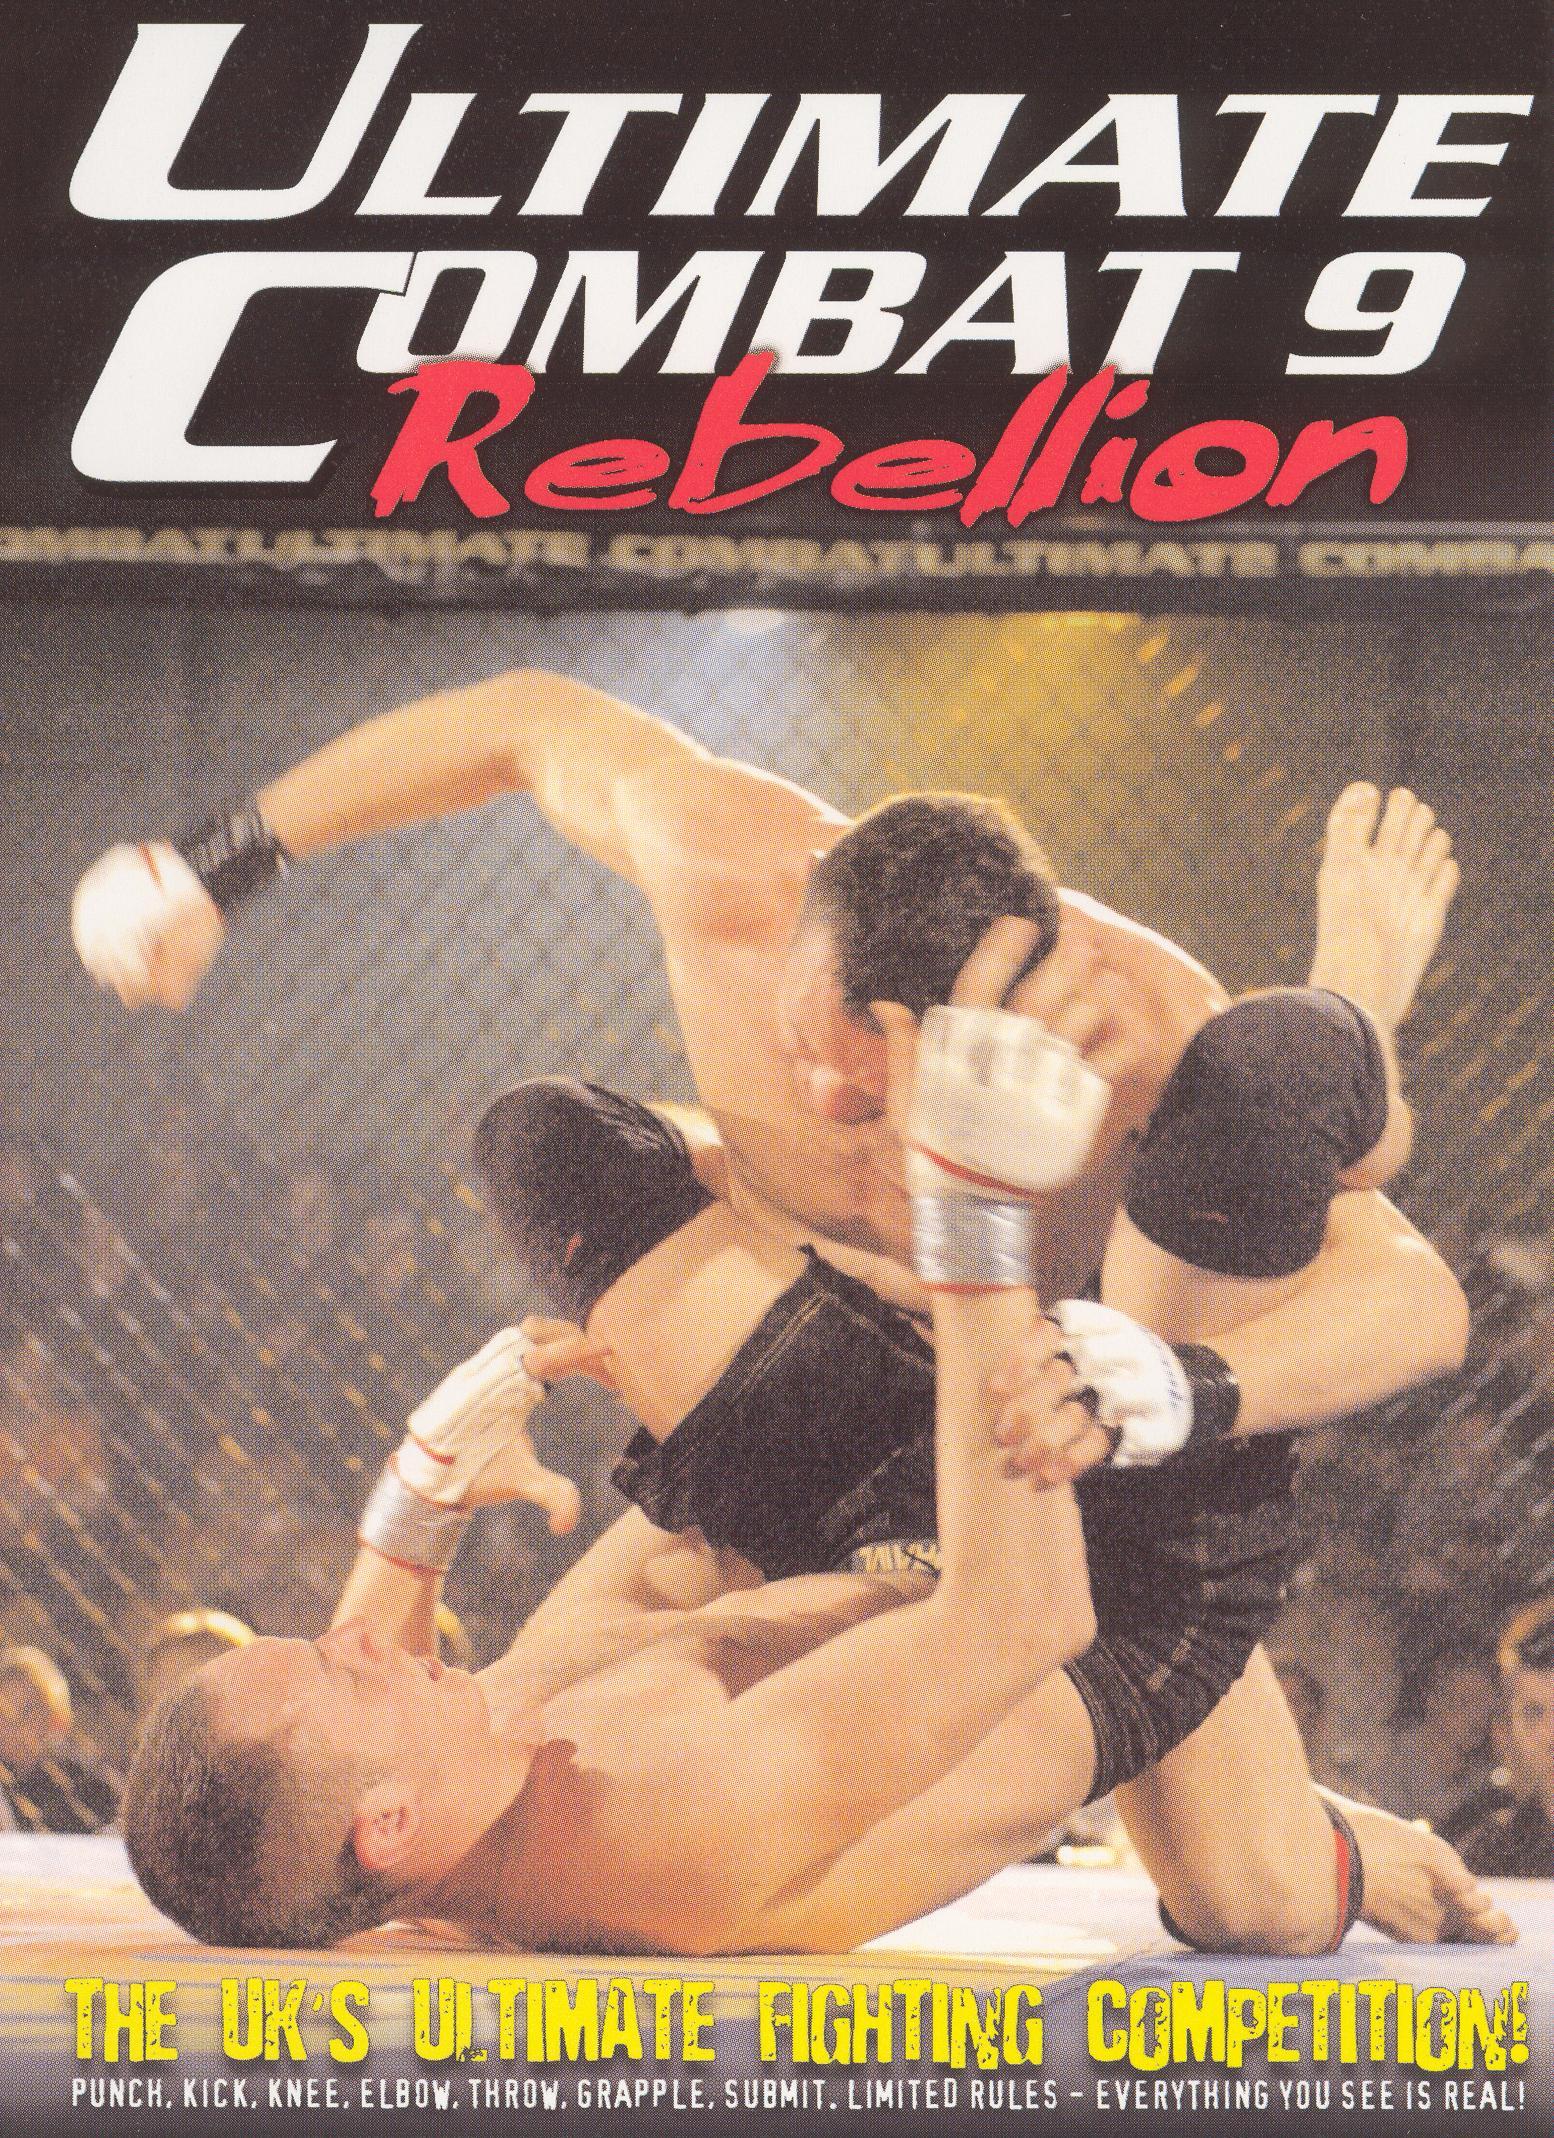 Ultimate Combat 9: Rebellion